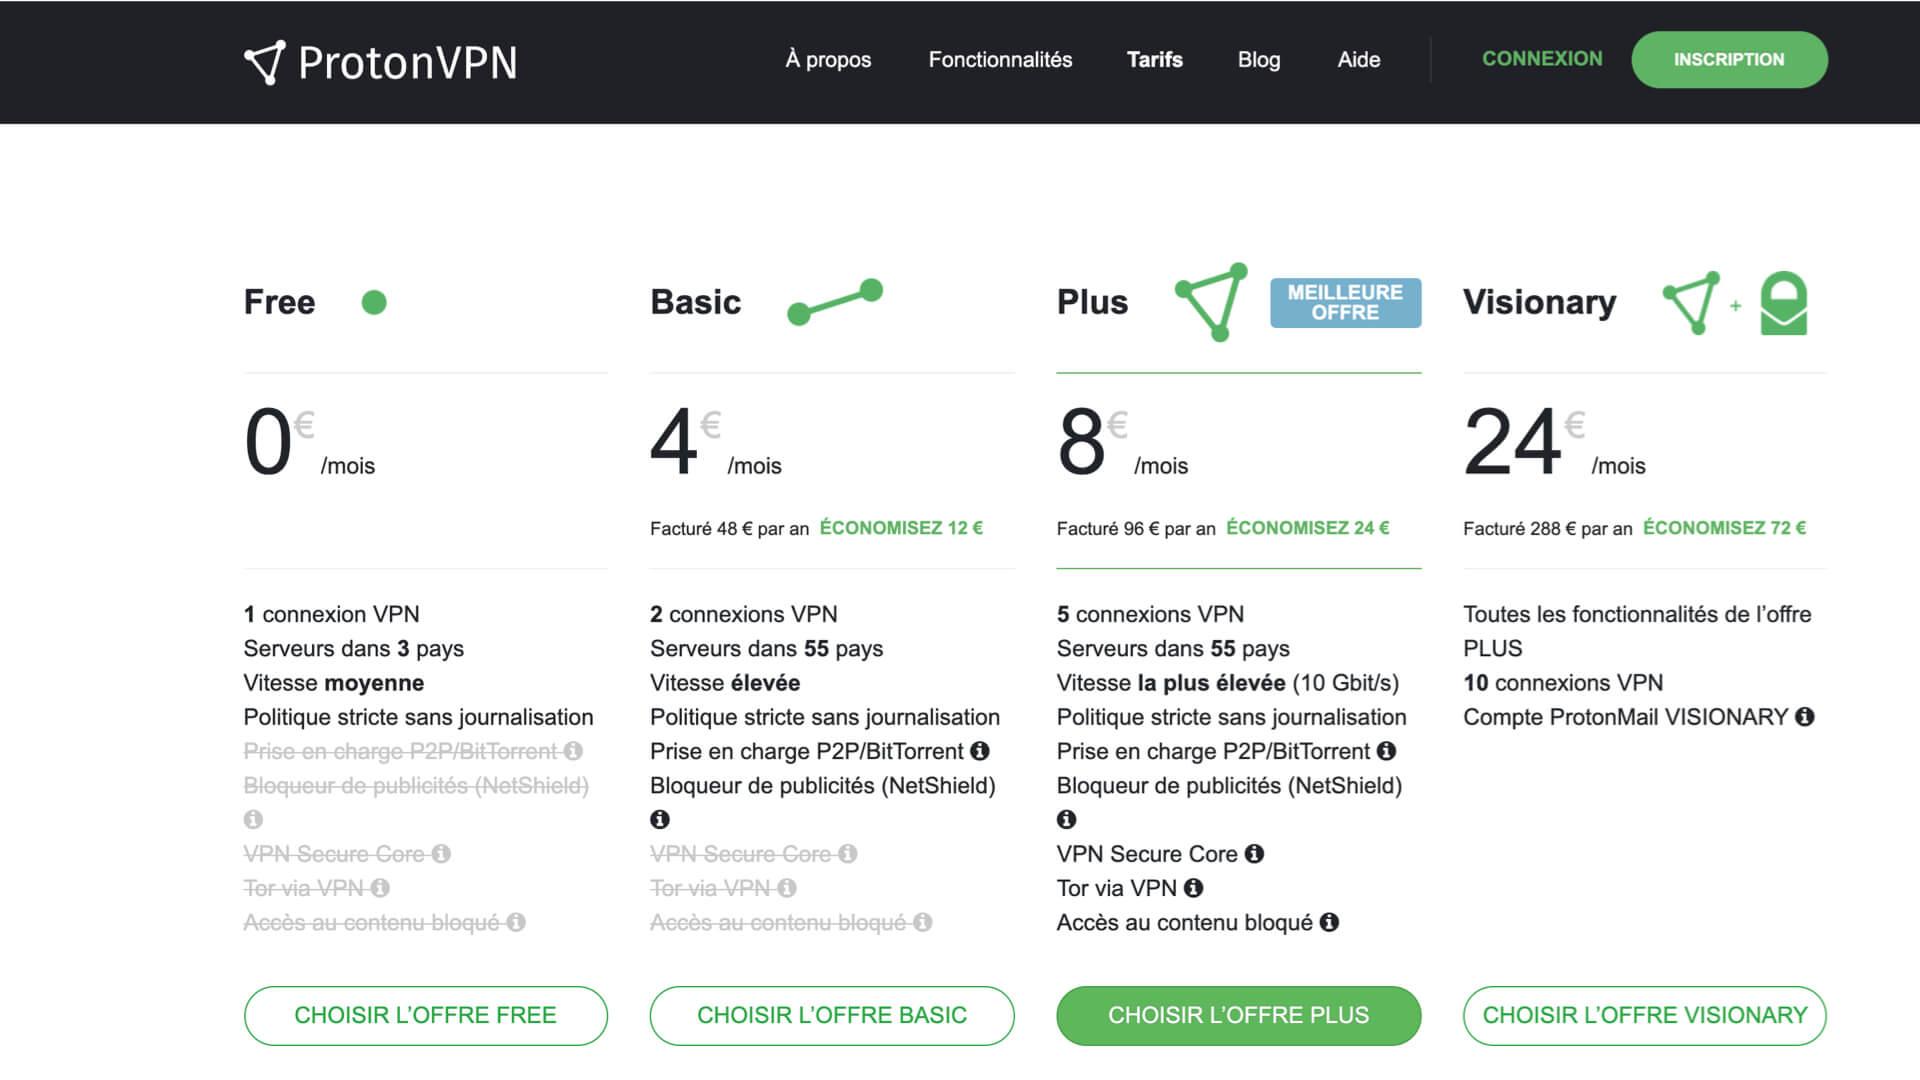 VPN gratuit ProtonVPN